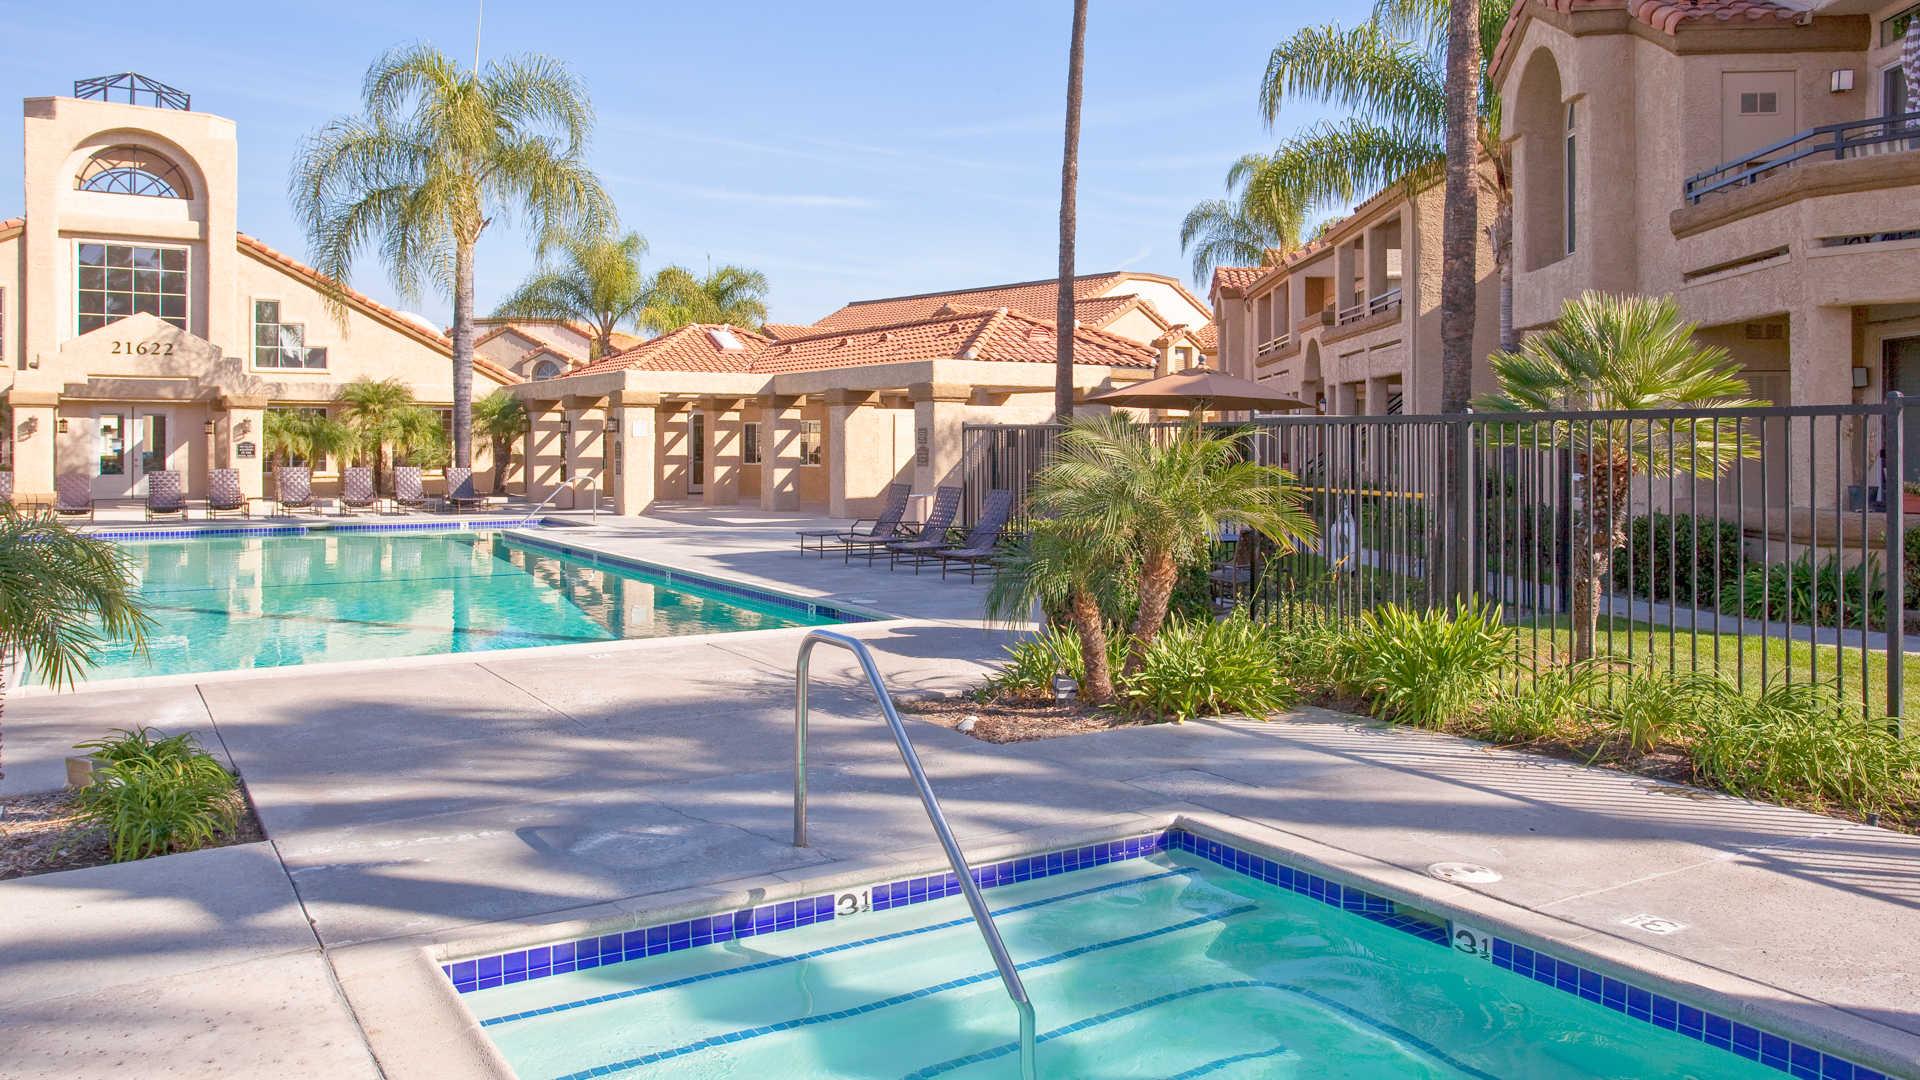 Vista Del Lago Apartments Reviews In Mission Viejo   21622 Marguerite Pkwy  | EquityApartments.com